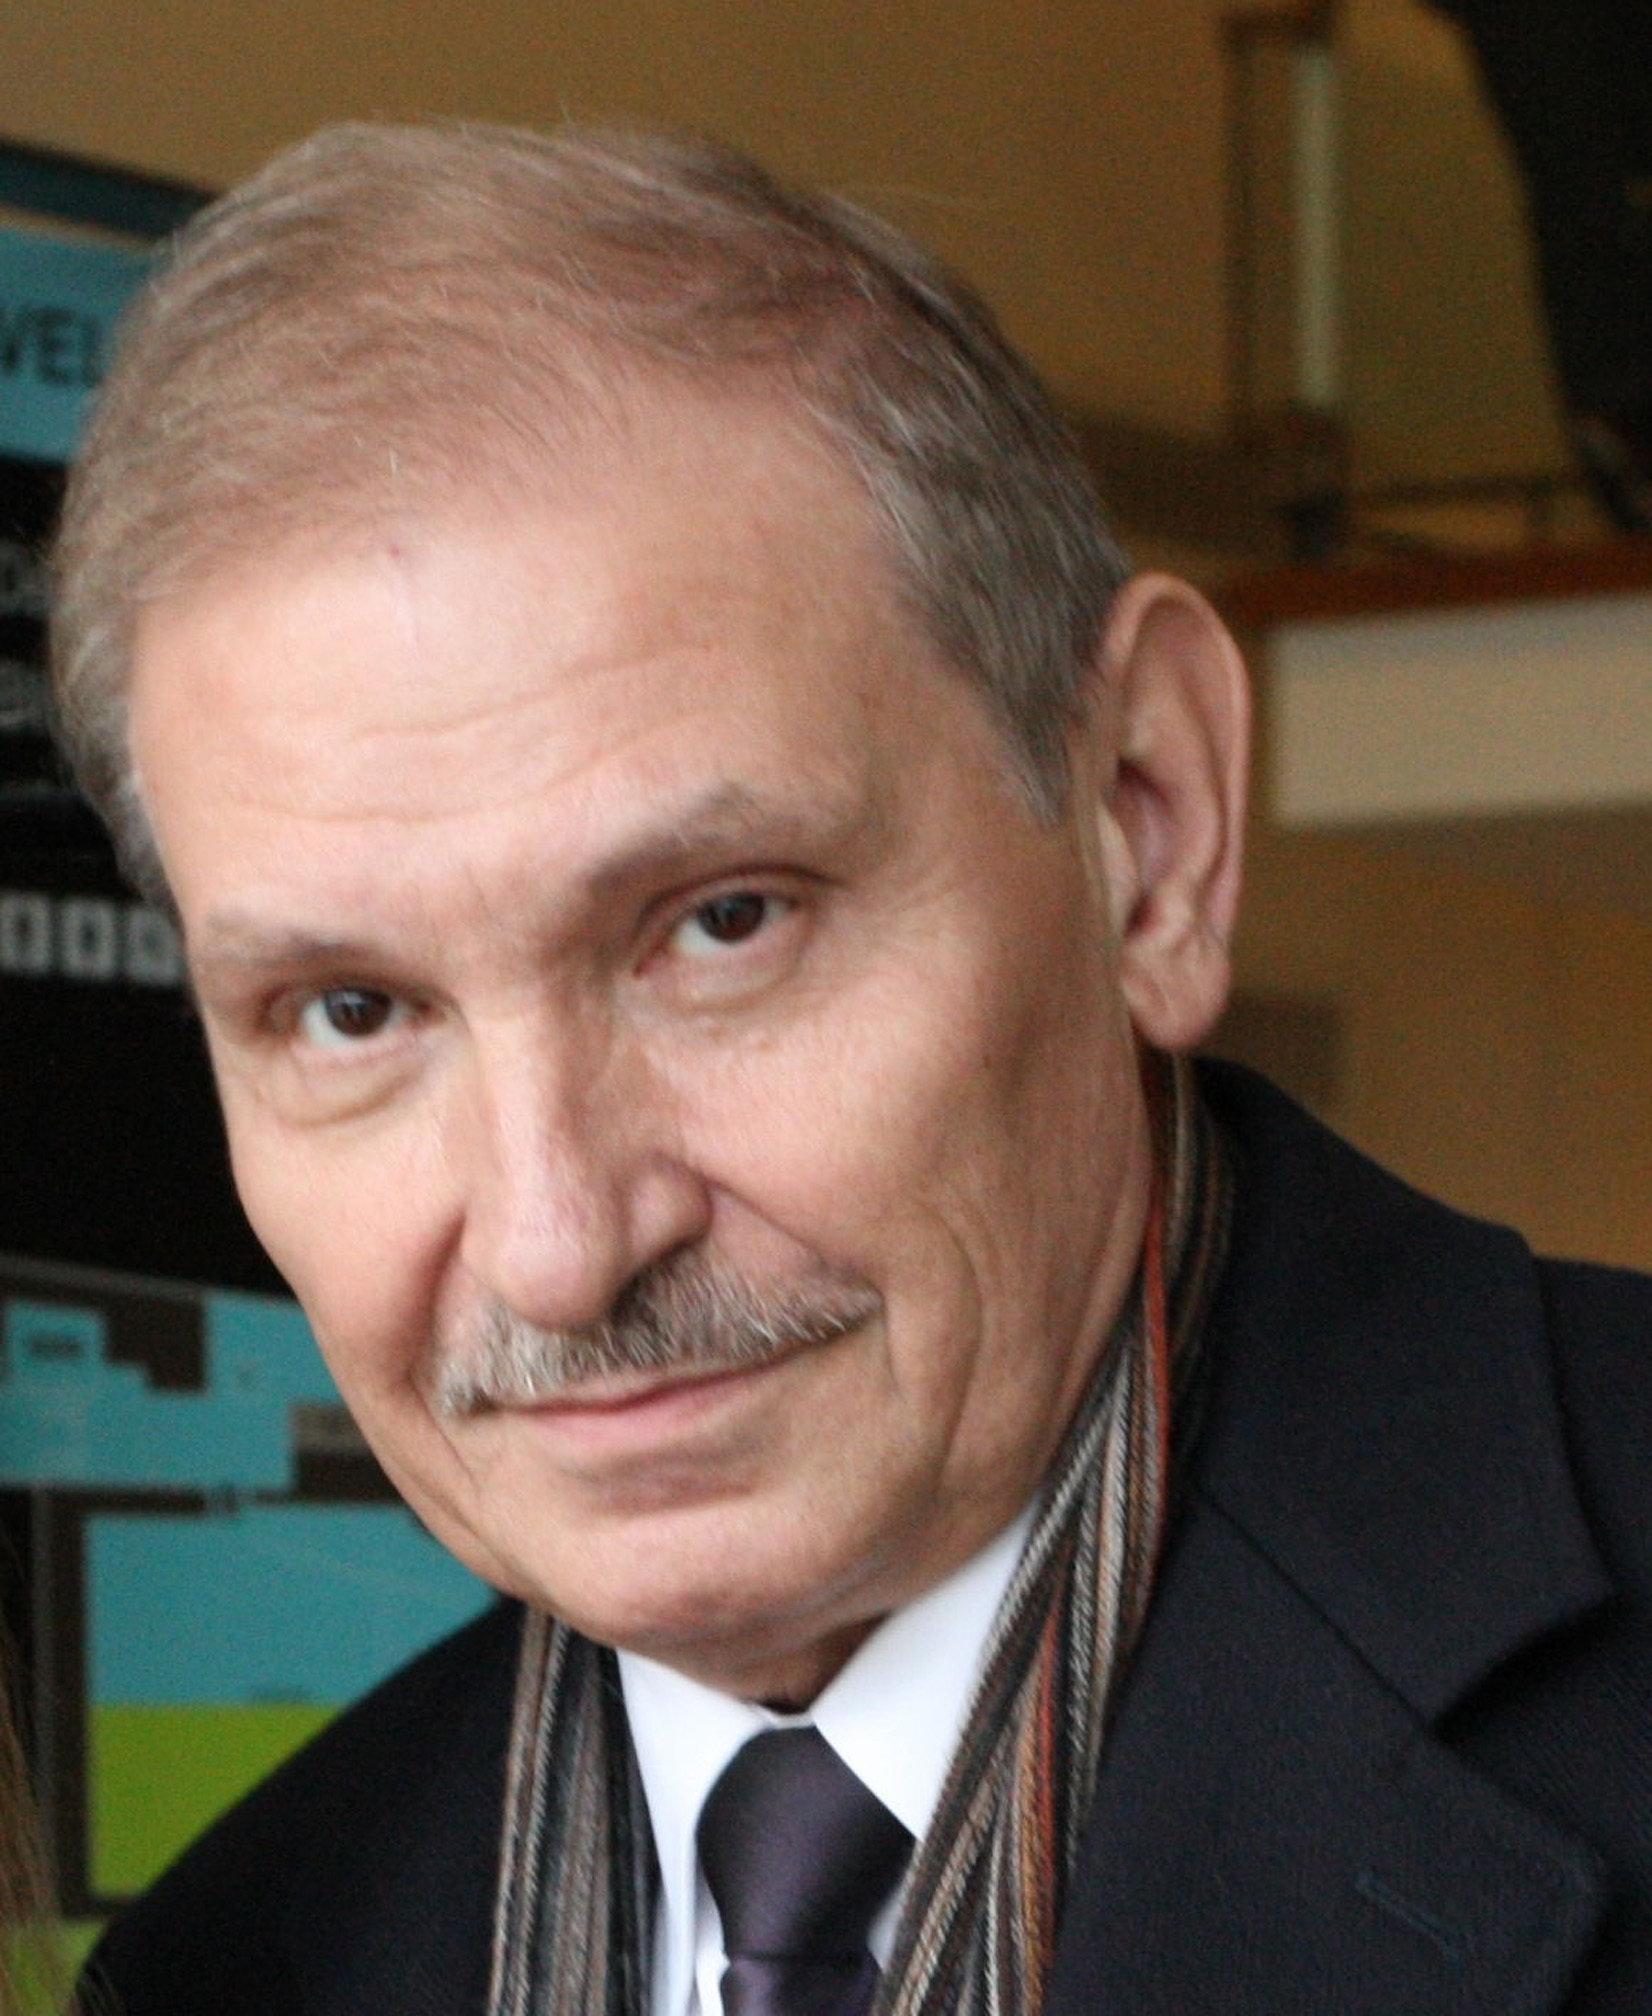 Glushkov was found dead in March this